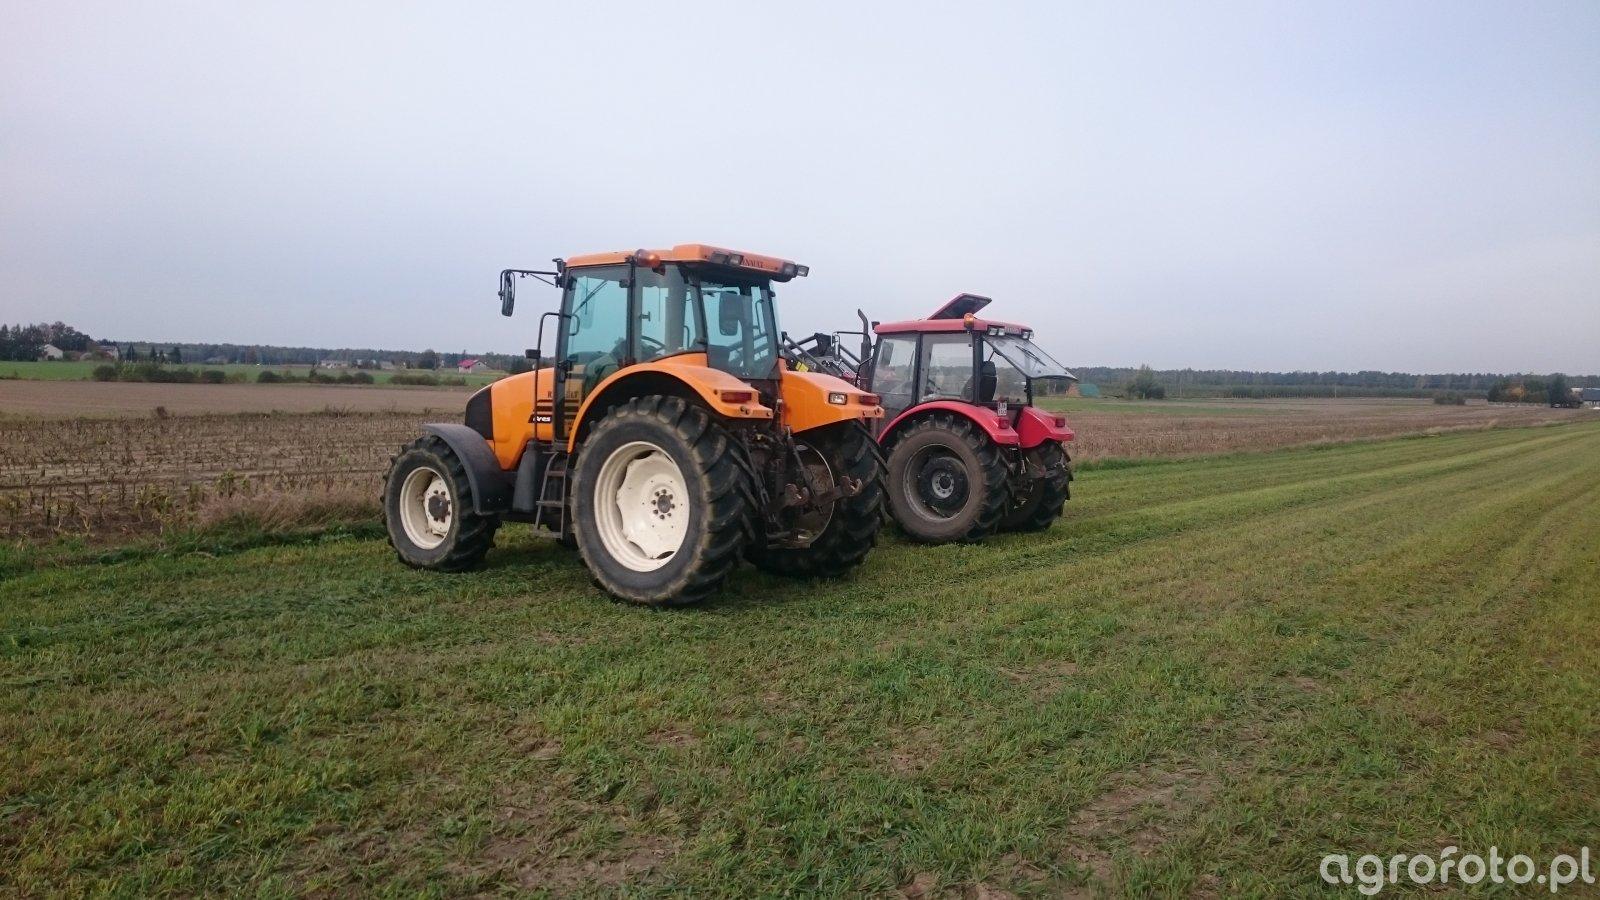 Renault Ares 620 RZ + Farmer 8244C2